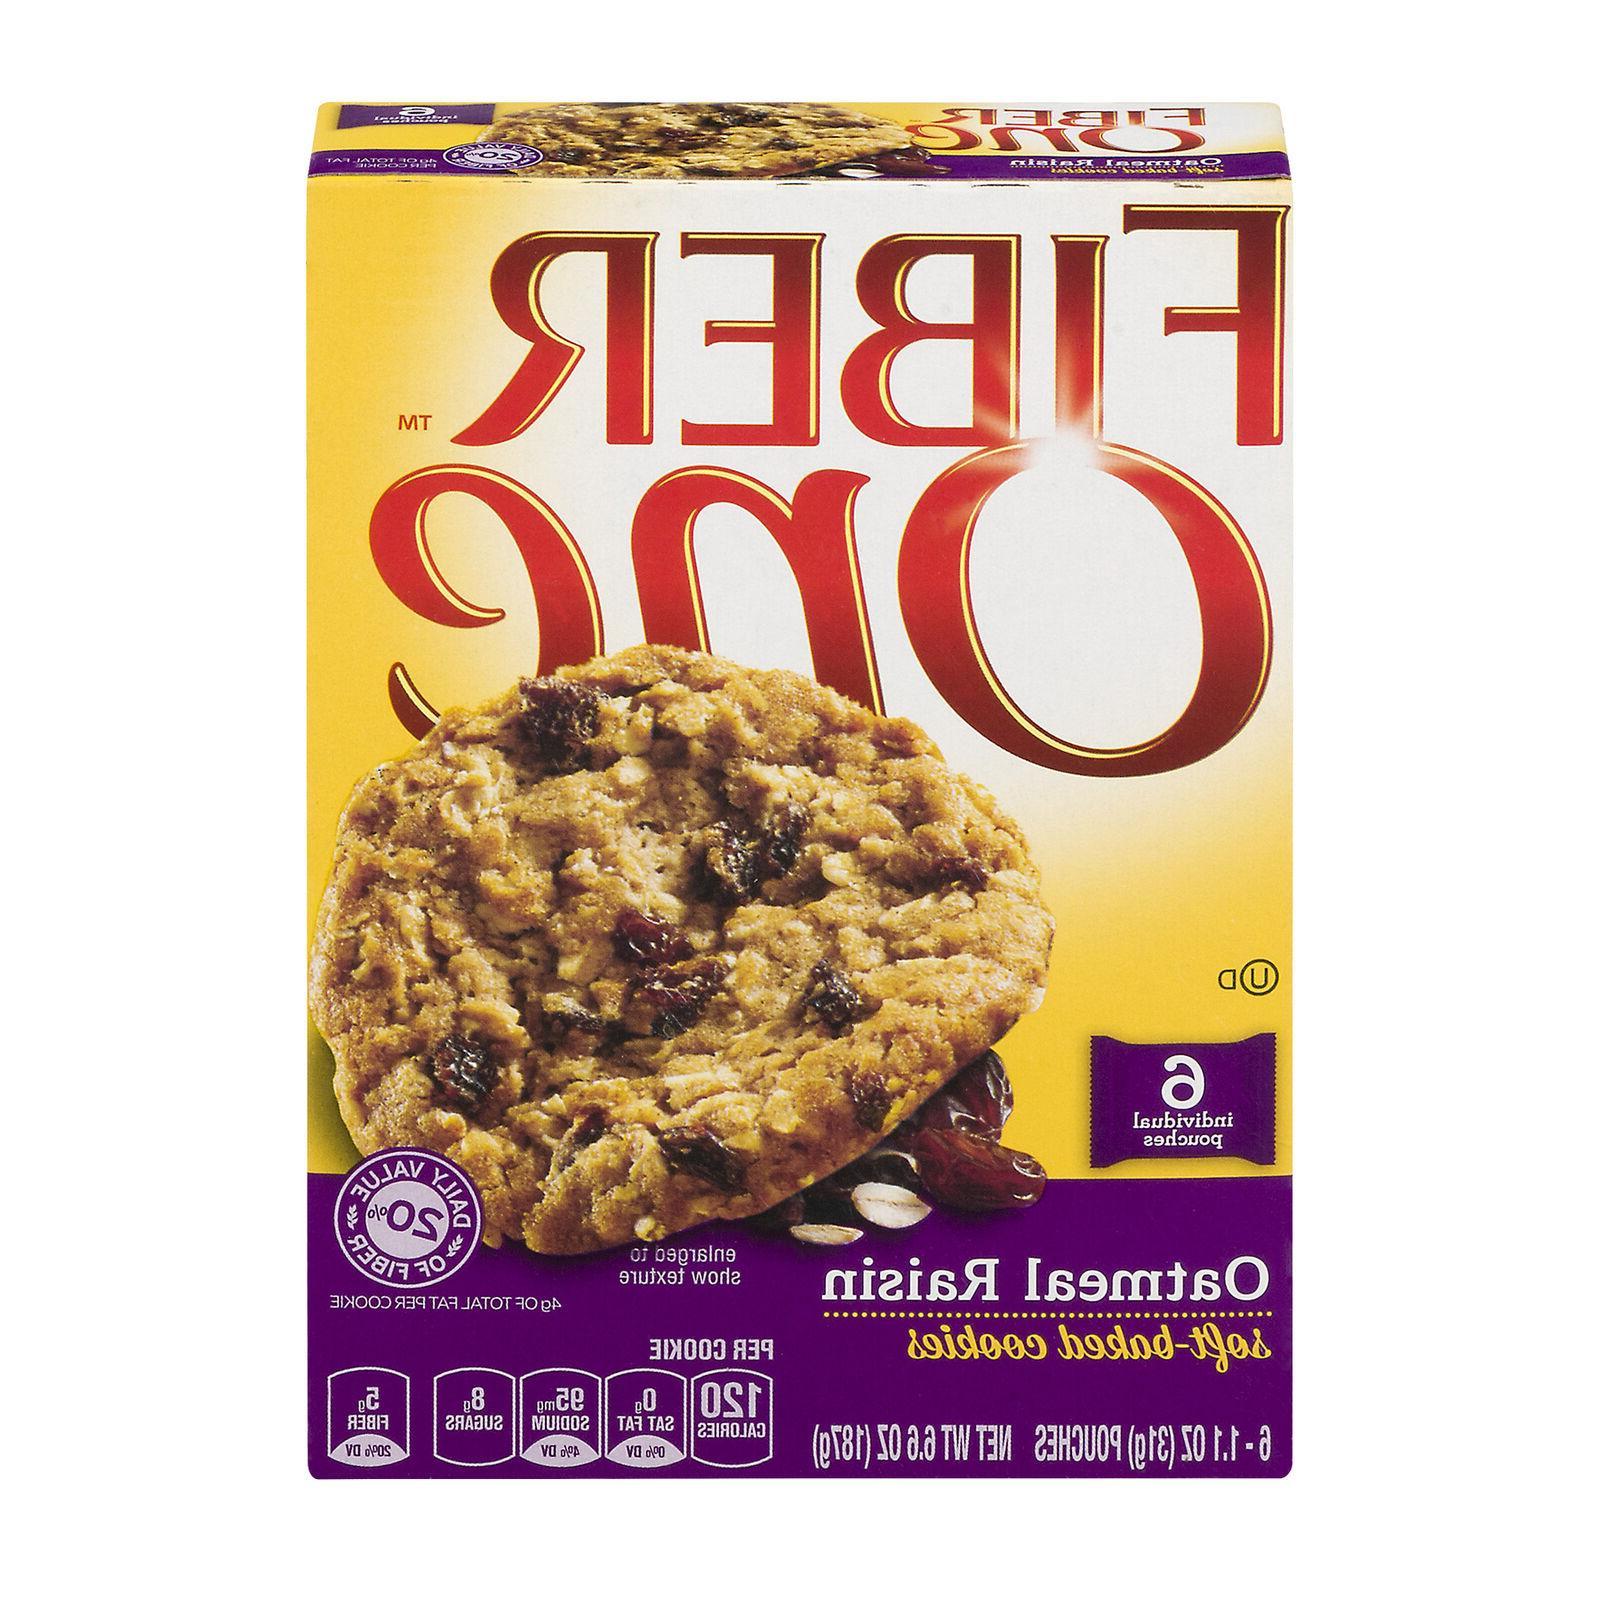 6 Fiber One Raisin Cookies, Shipping